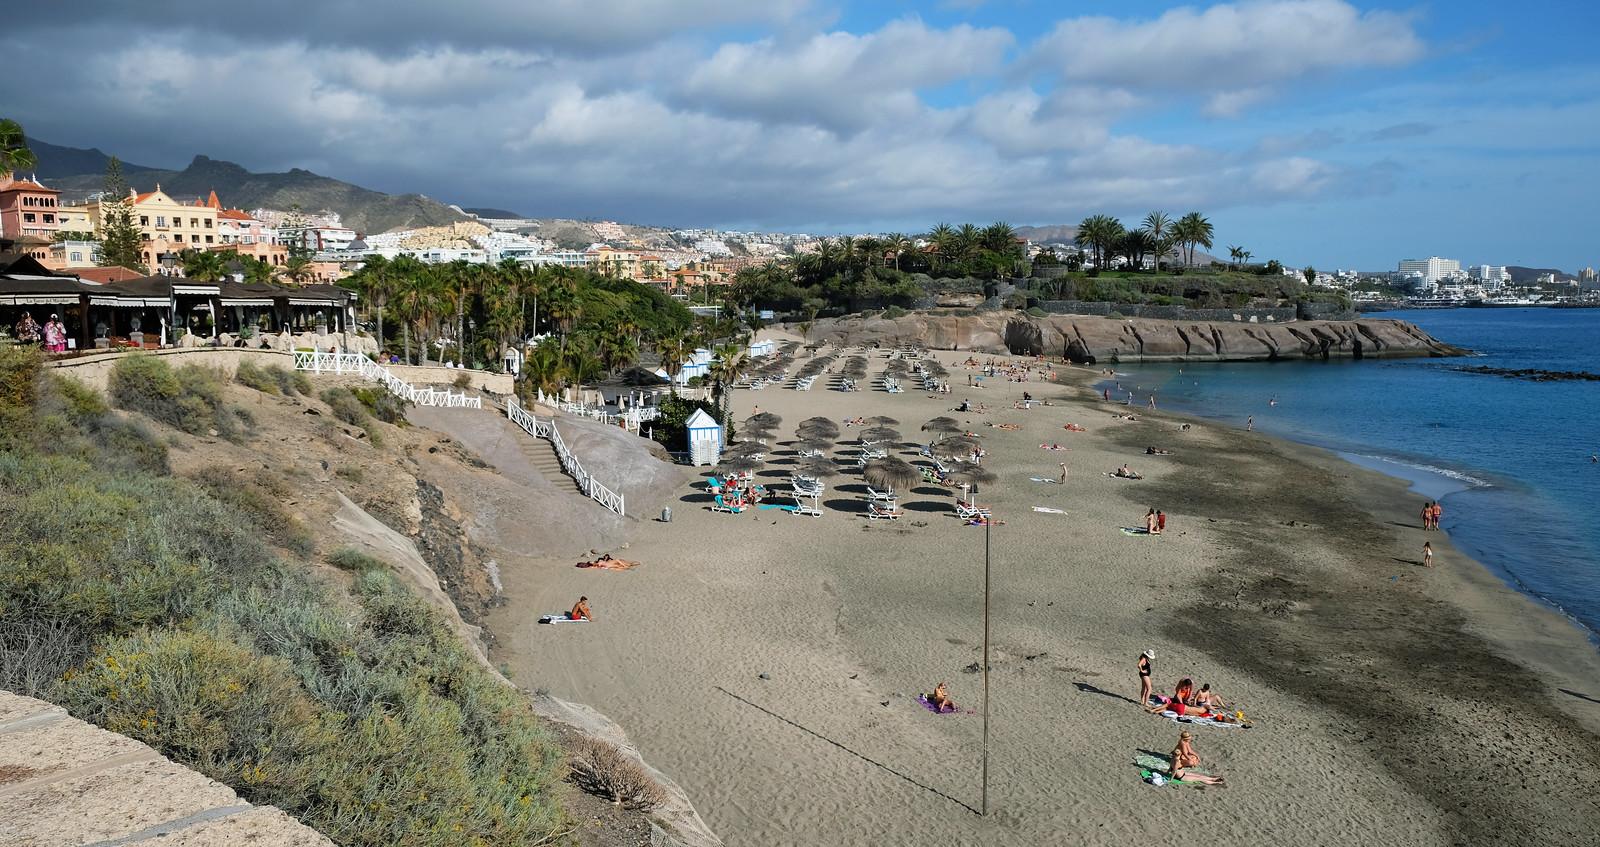 El Duque Beach, Costa Adeje, Tenerife, Canary Islands, Spain